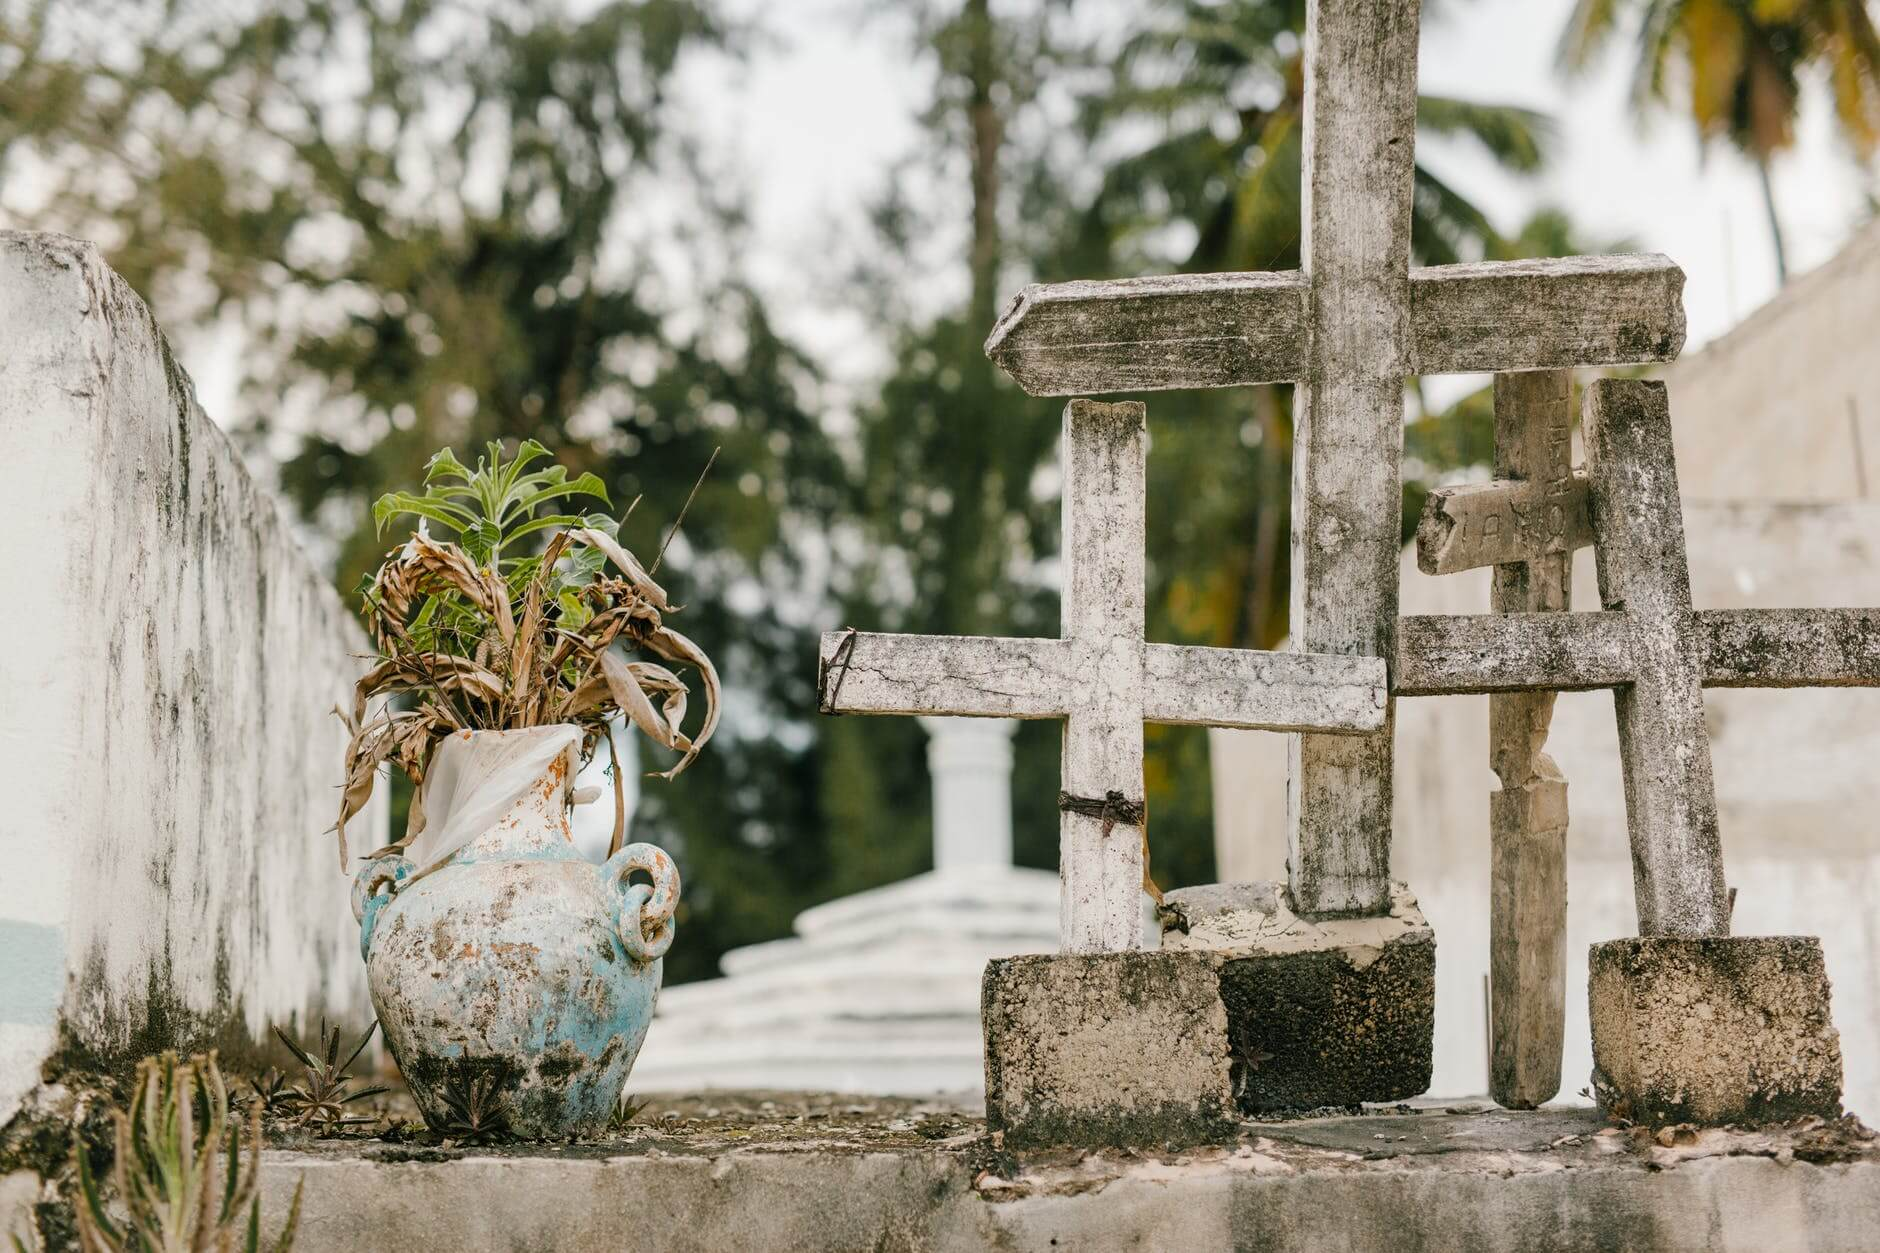 cremation services in Clarksville, TN